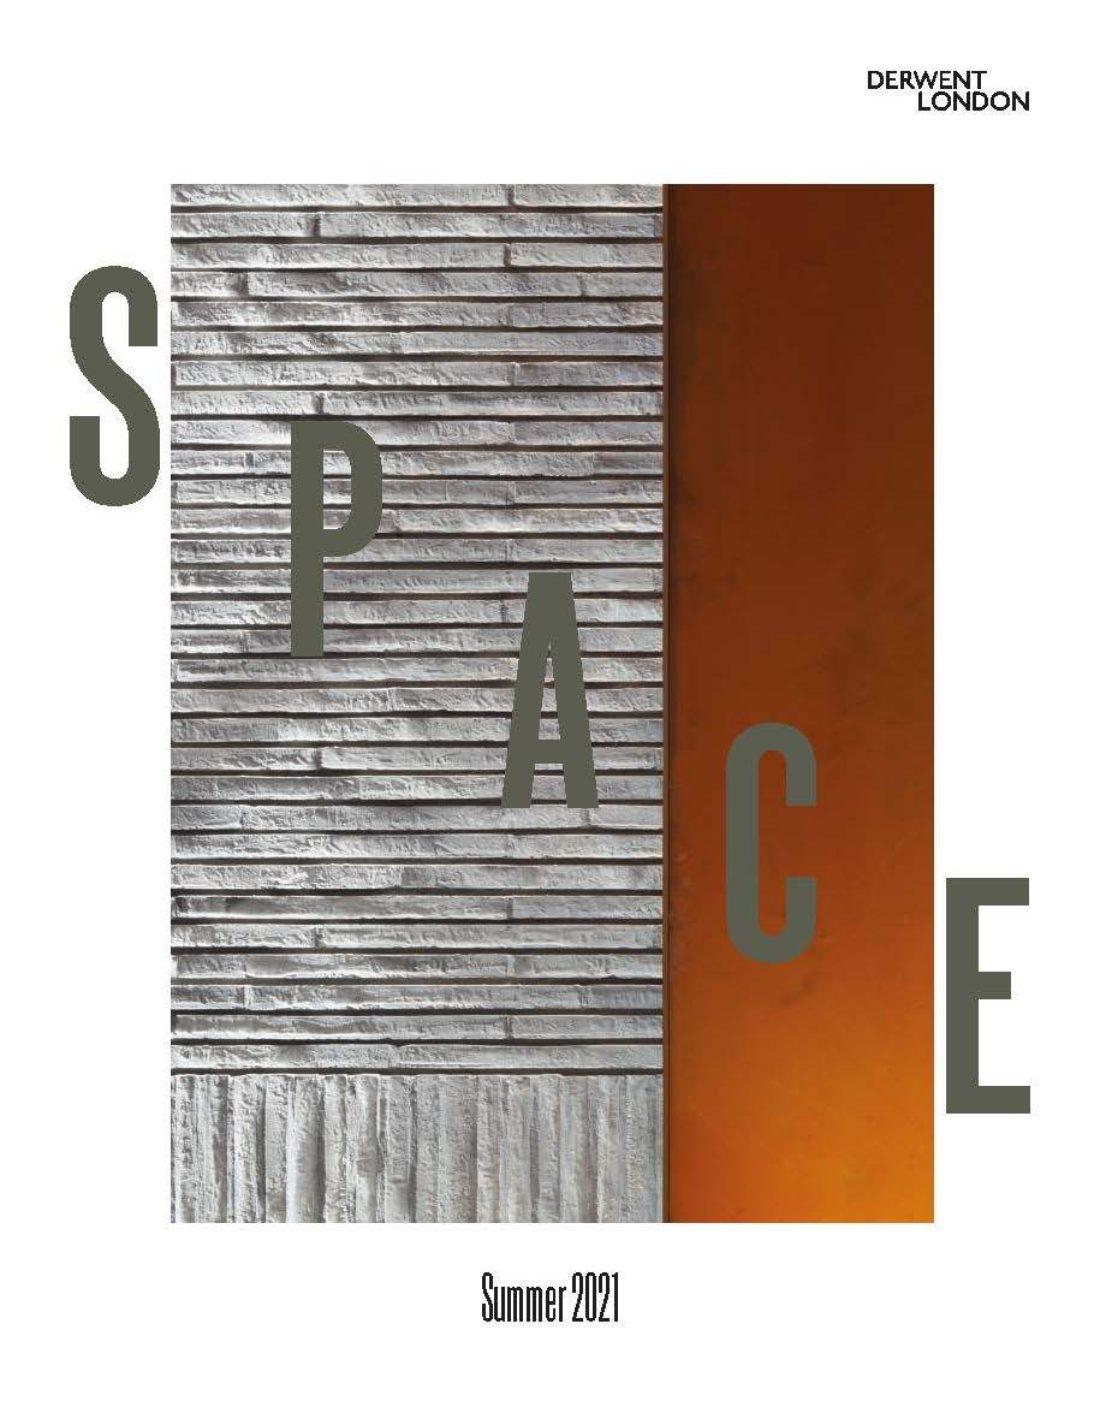 Space Magazine image